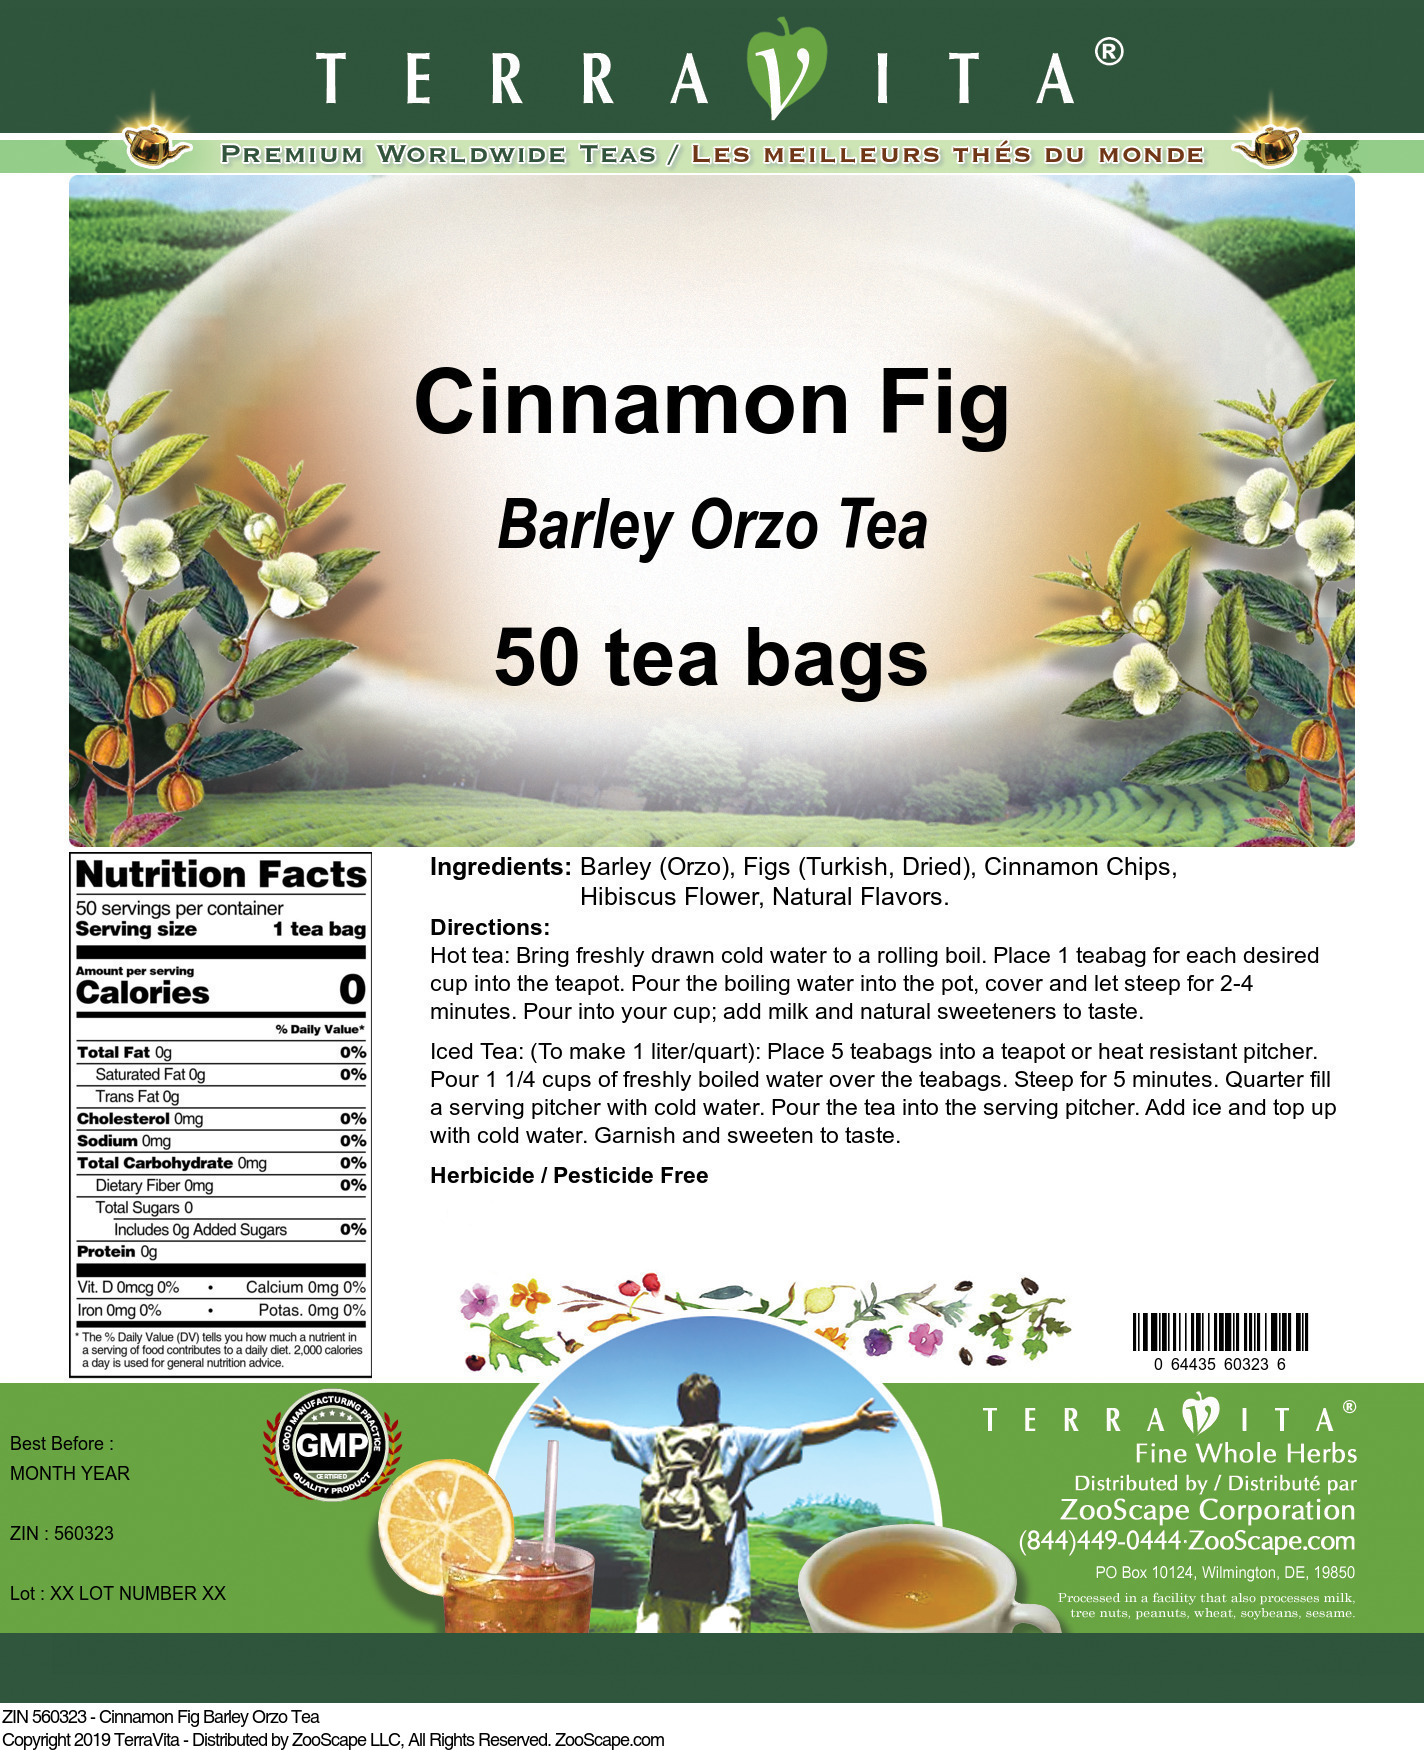 Cinnamon Fig Barley Orzo Tea